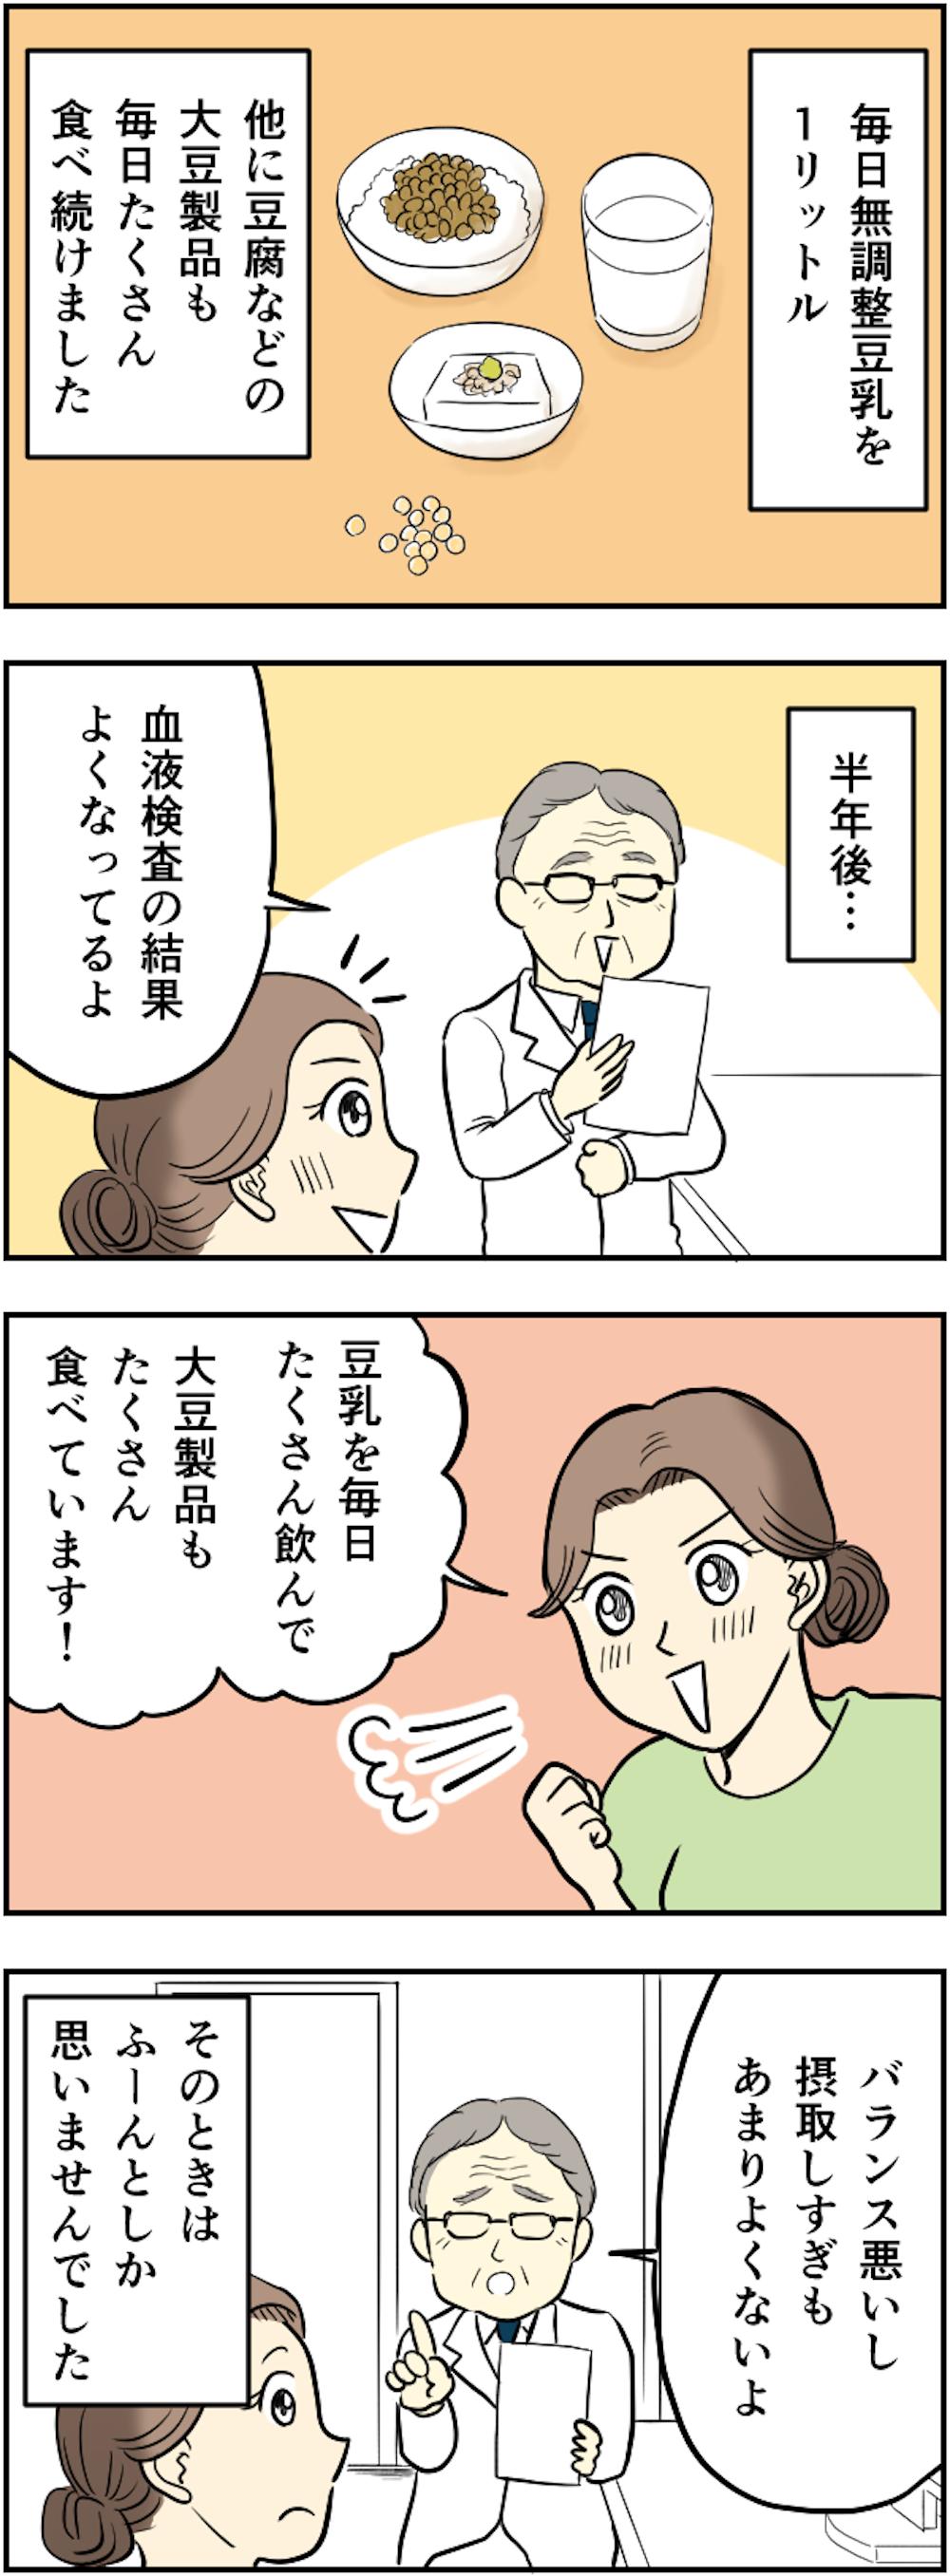 45kansei_005.png